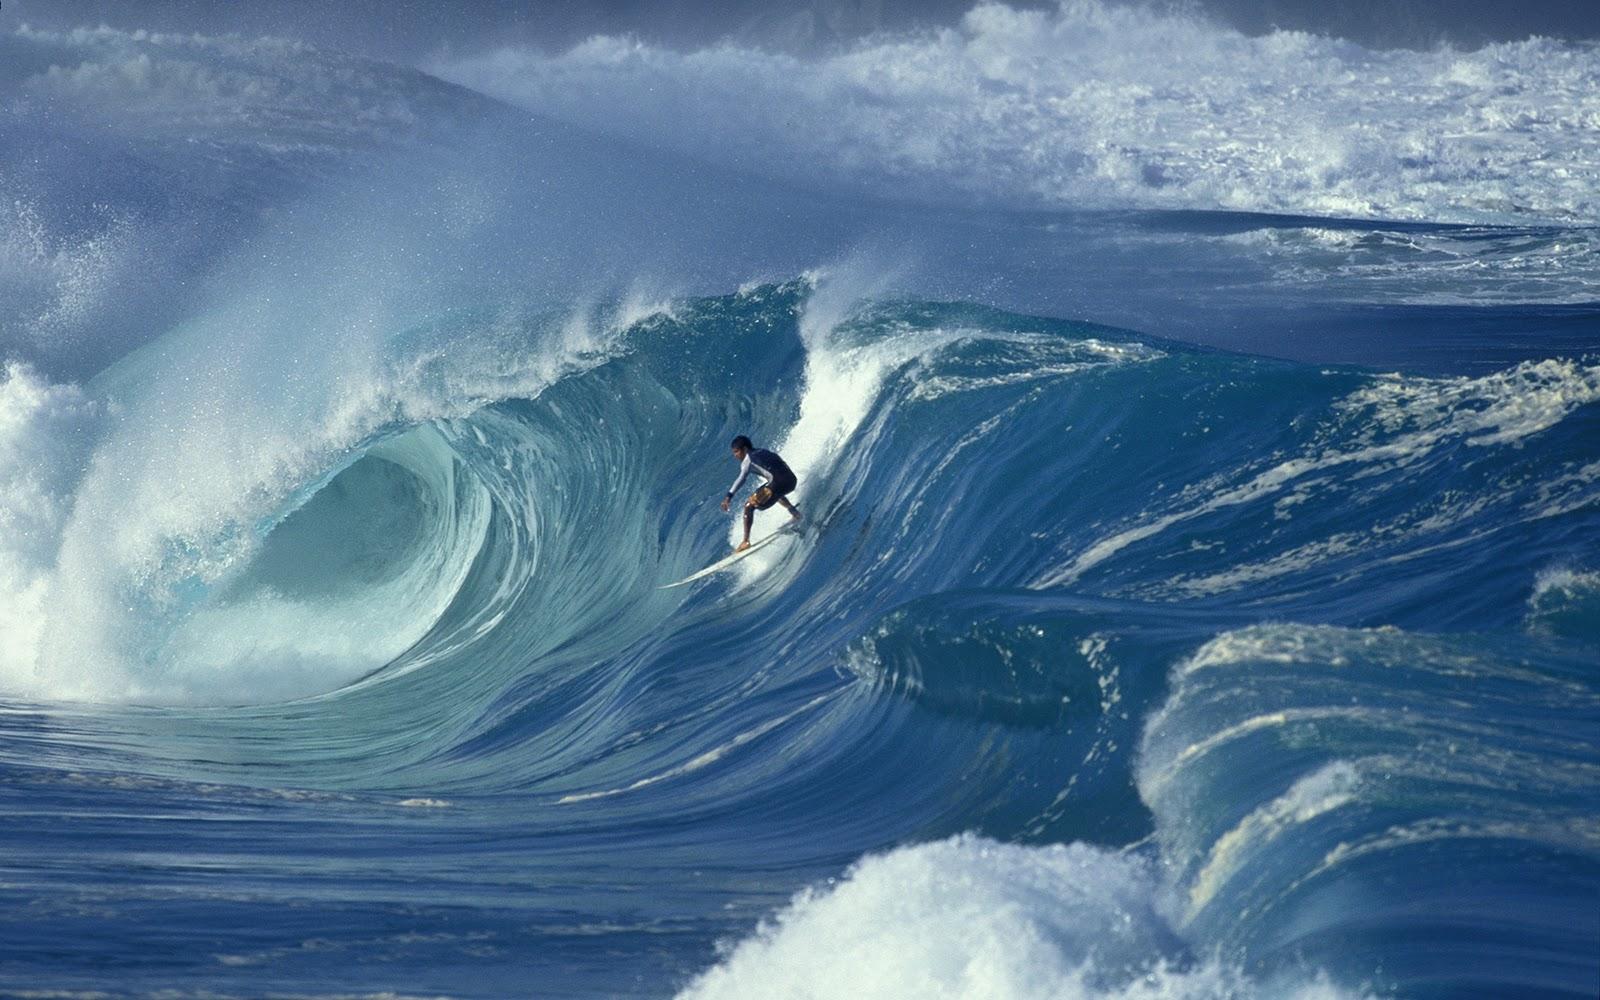 Surfing Wallpapers 1920x1200 Wallpapers HD Desktop 1600x1000